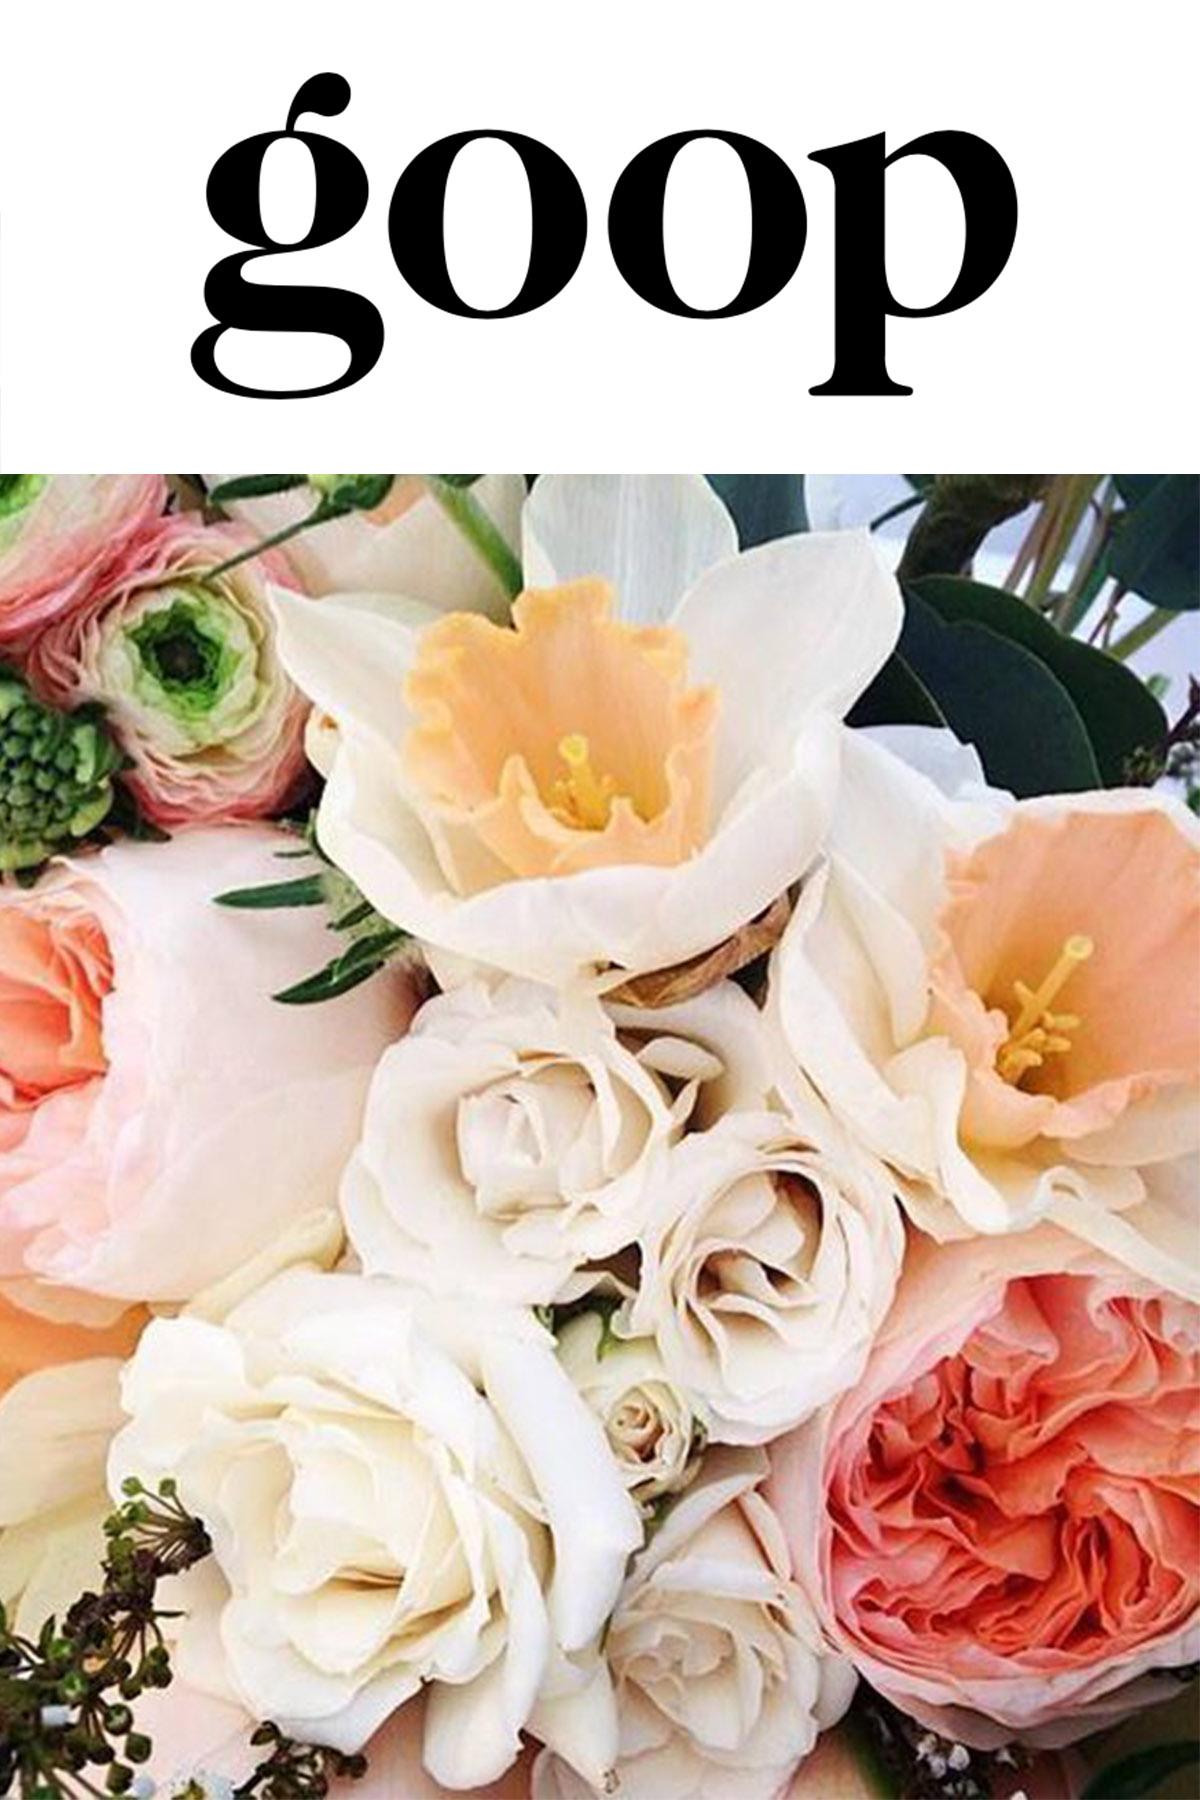 Goop City Guide: The Best Florists